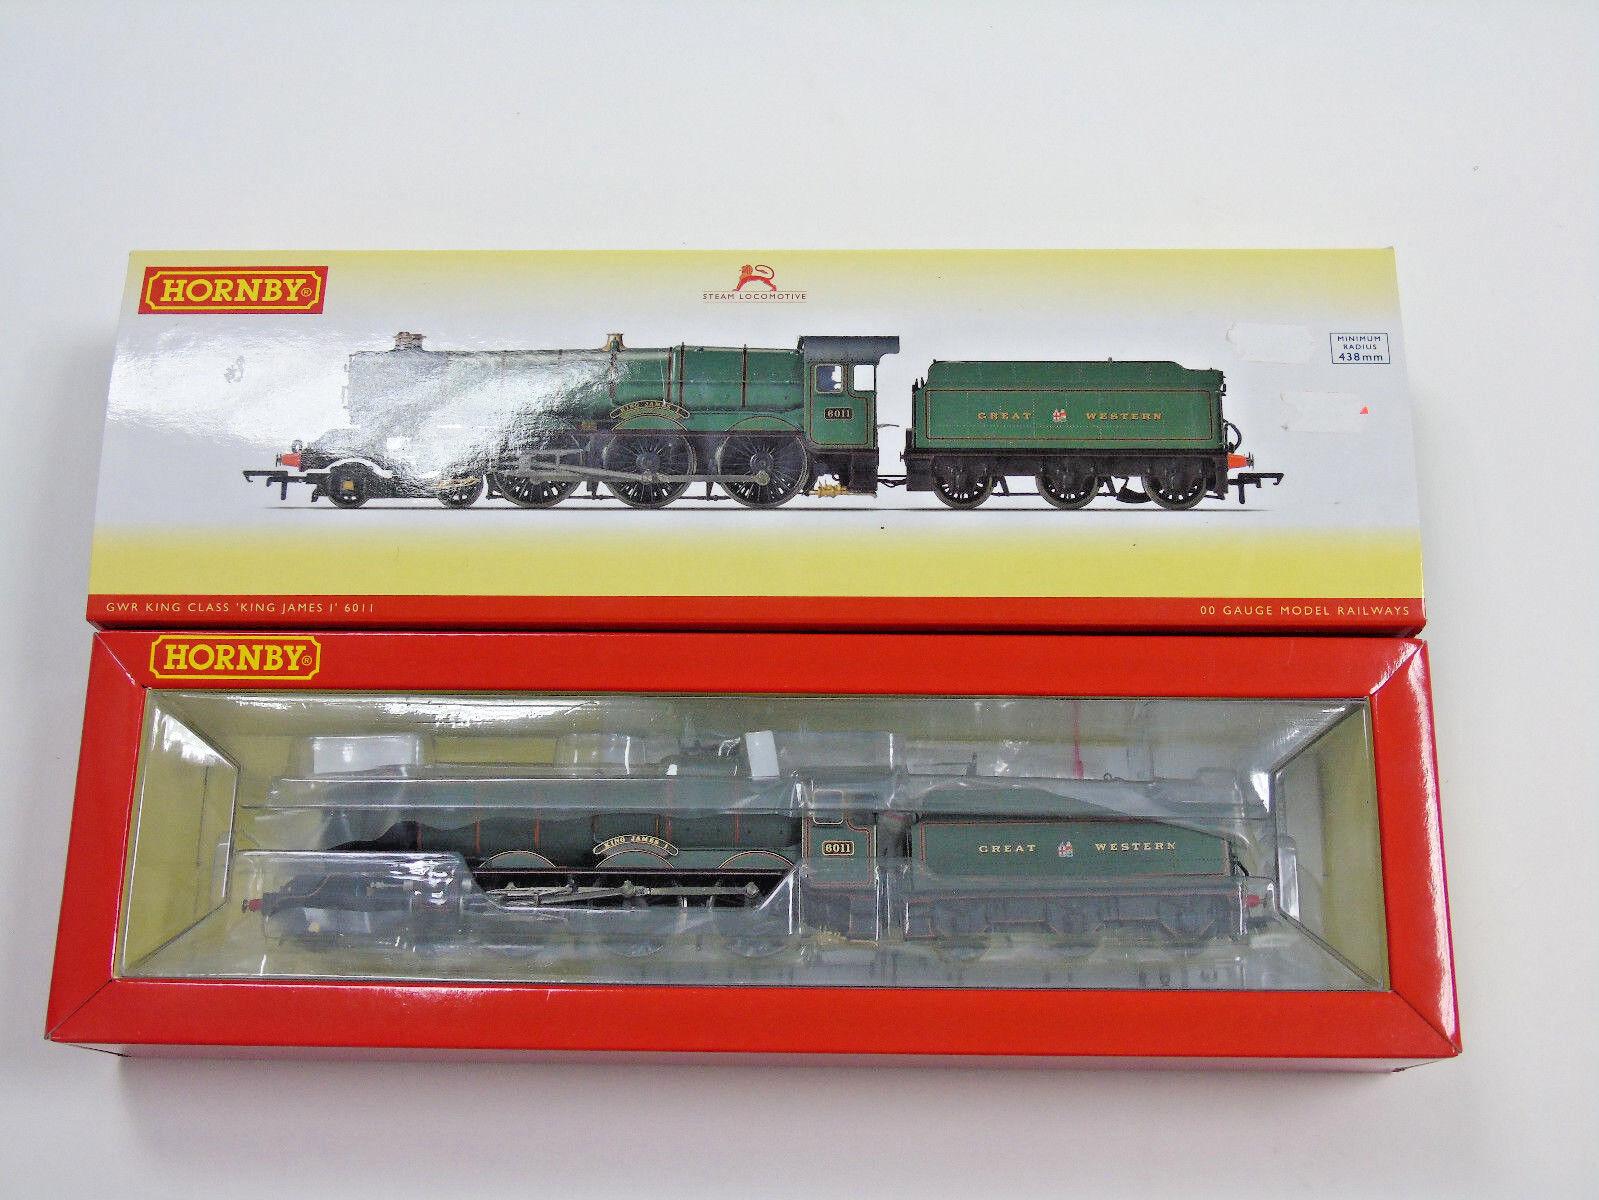 R3331 Hornby oo-messgerät Lokomotive GWR 4-6-0' King James I '6000 Klasse NEU